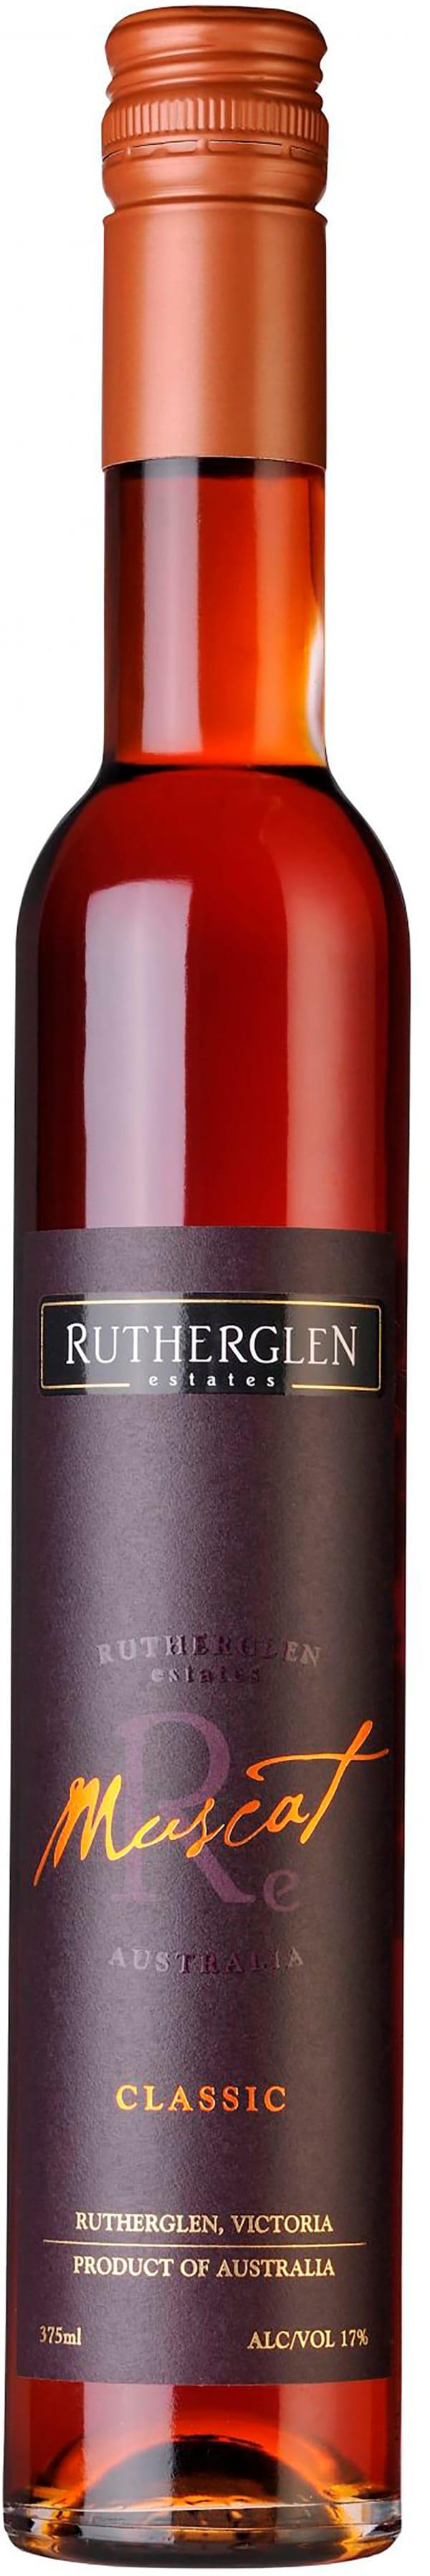 Rutherglen Estates Classic Muscat